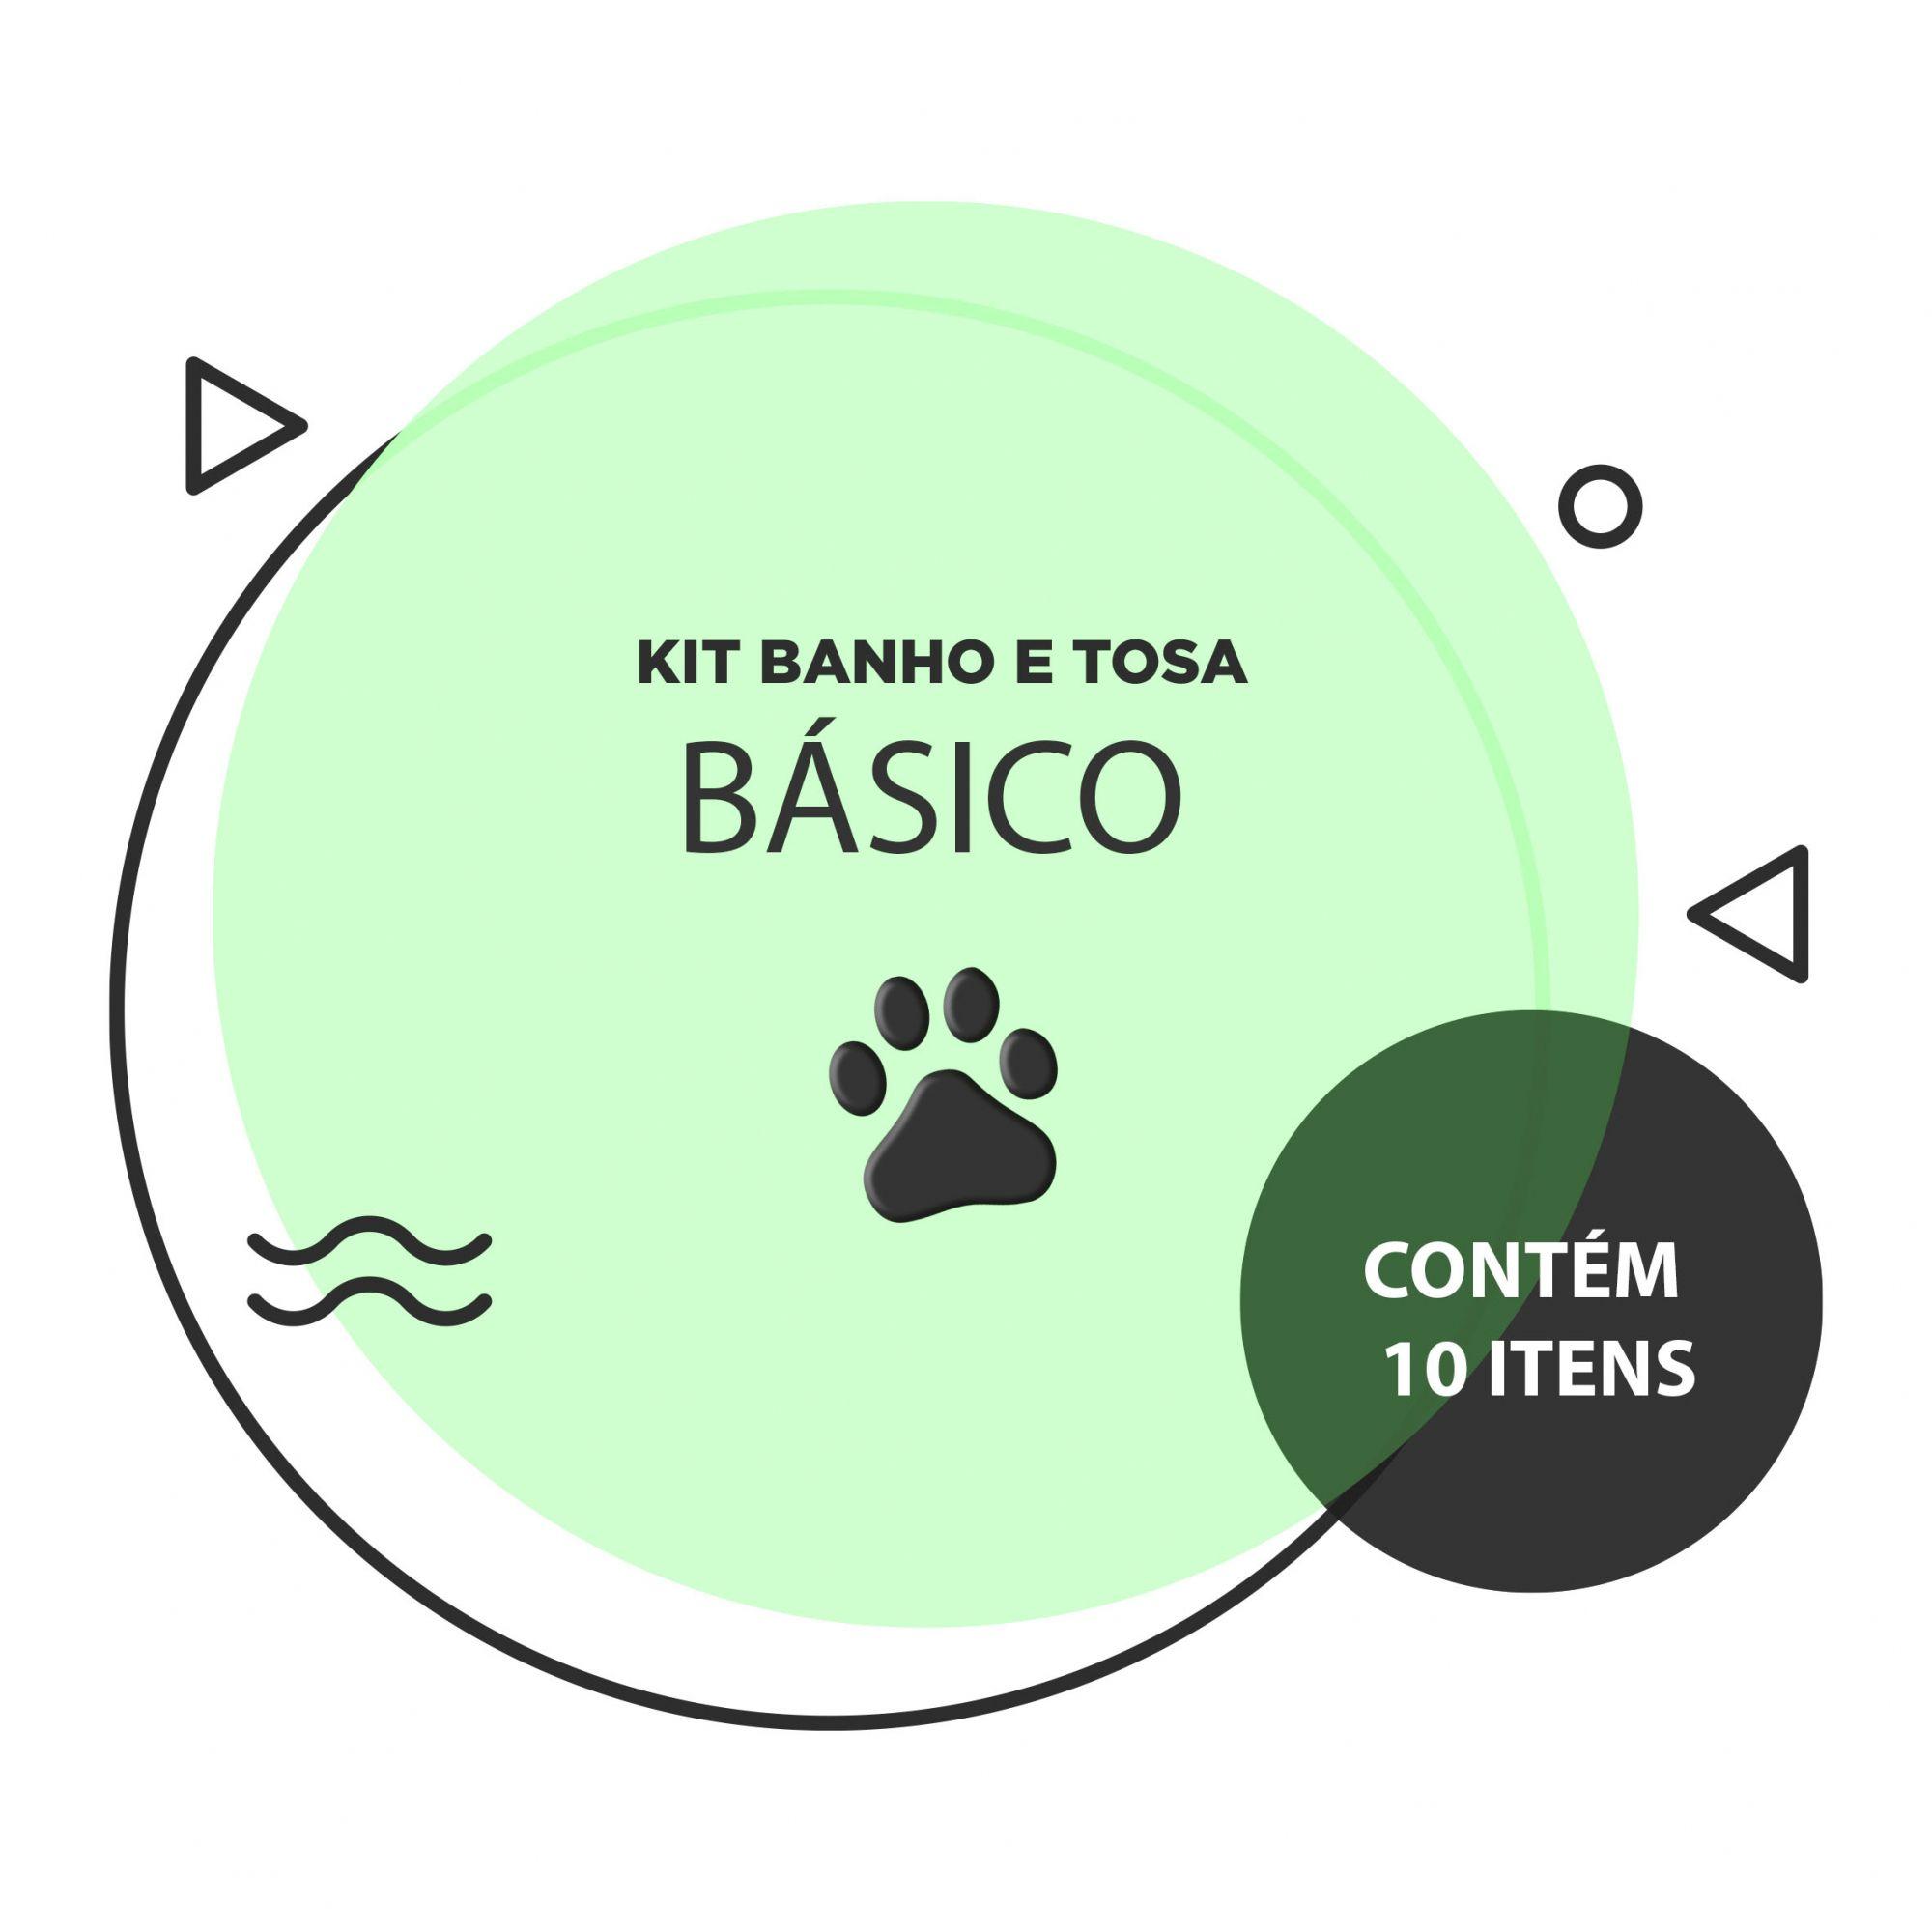 Kit Banho e Tosa - Básico